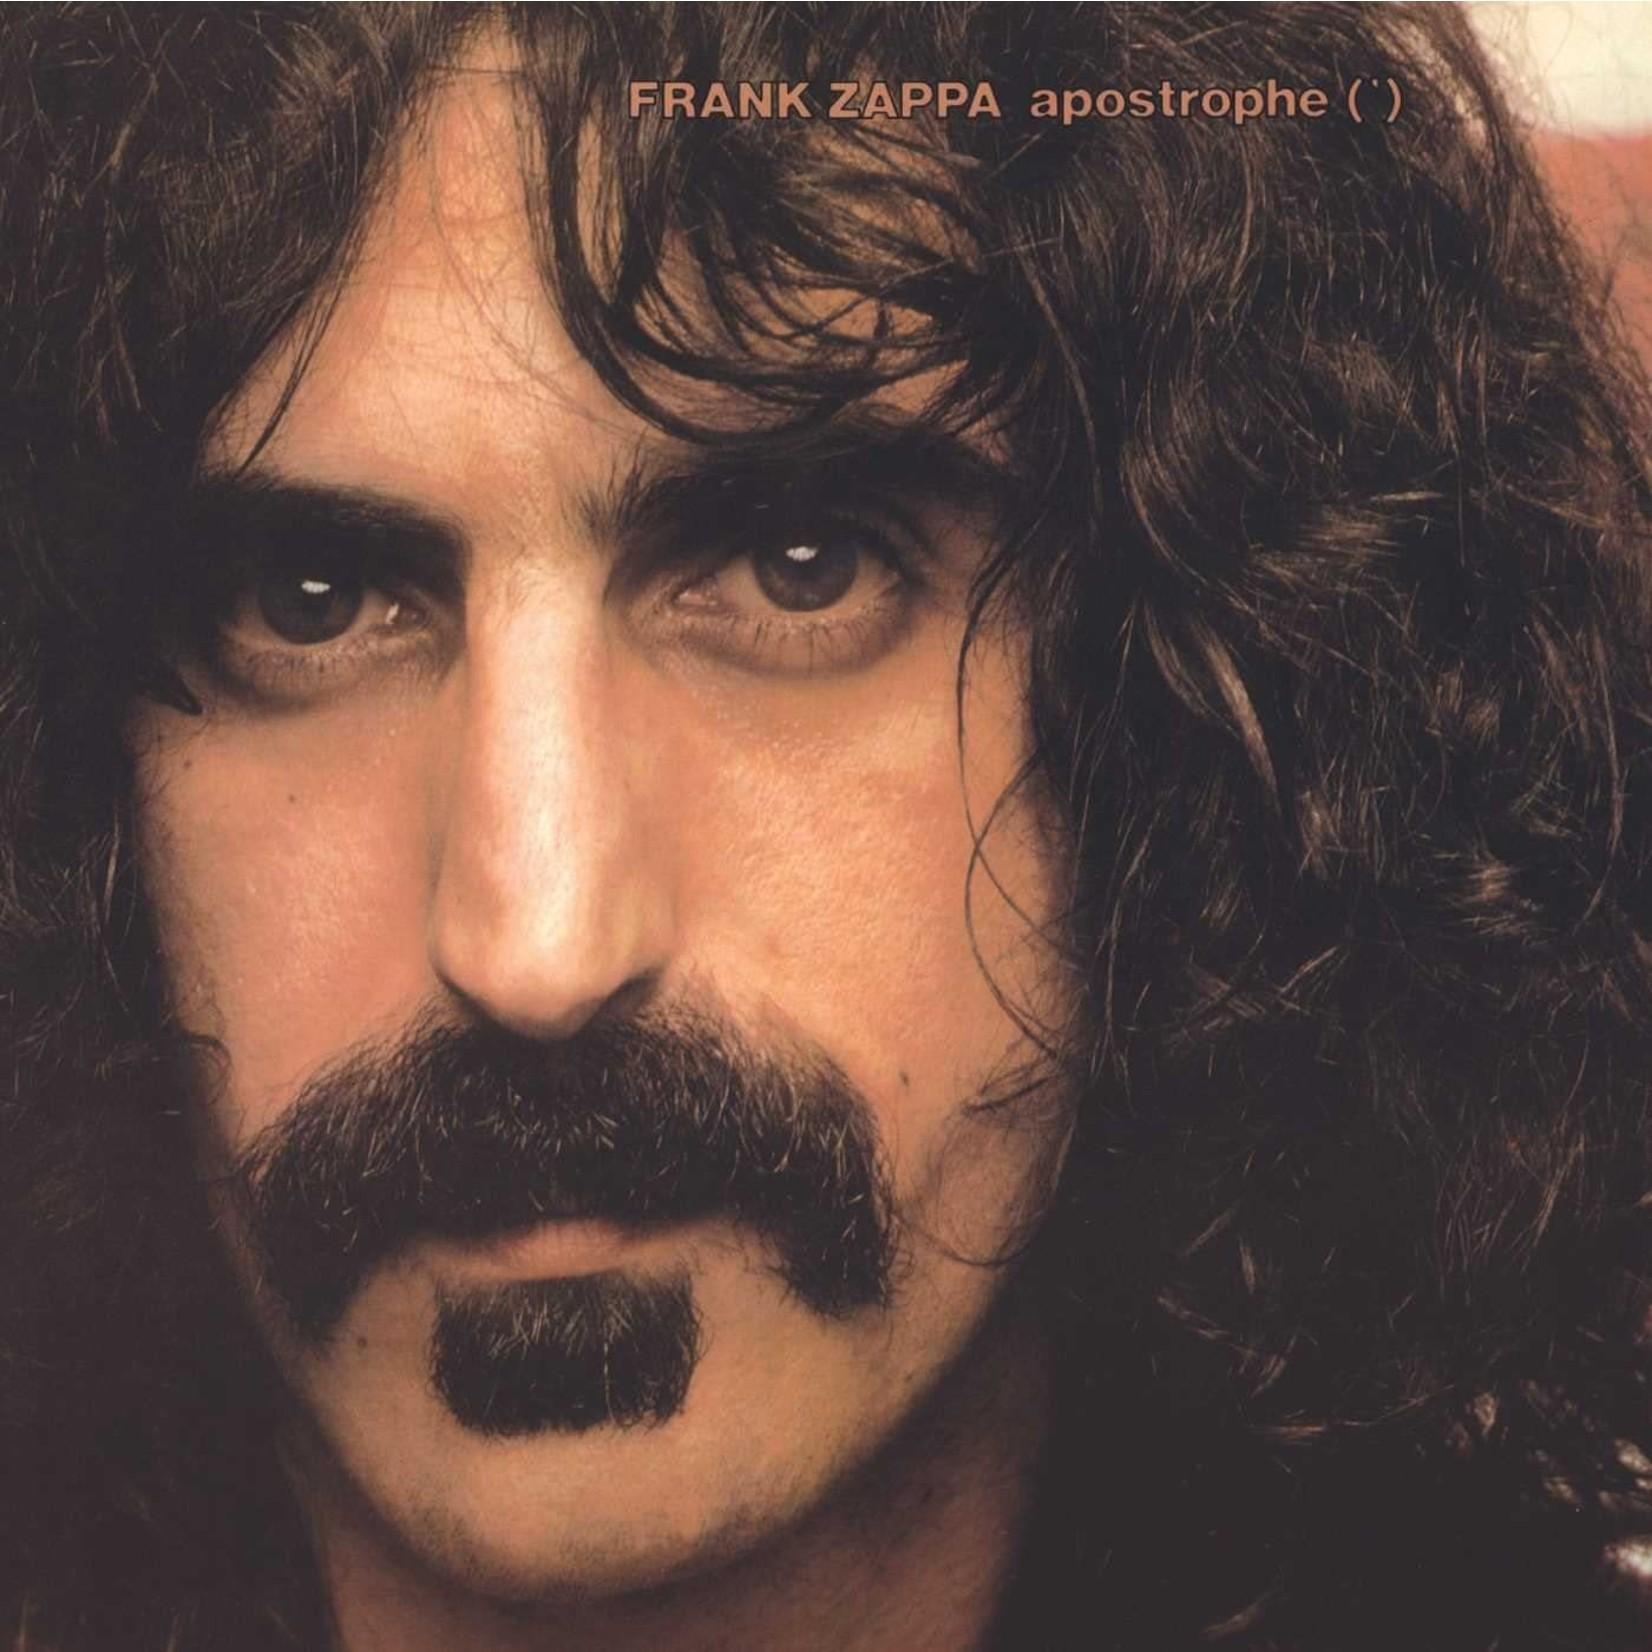 [Vintage] Zappa, Frank: Apostrophe (')